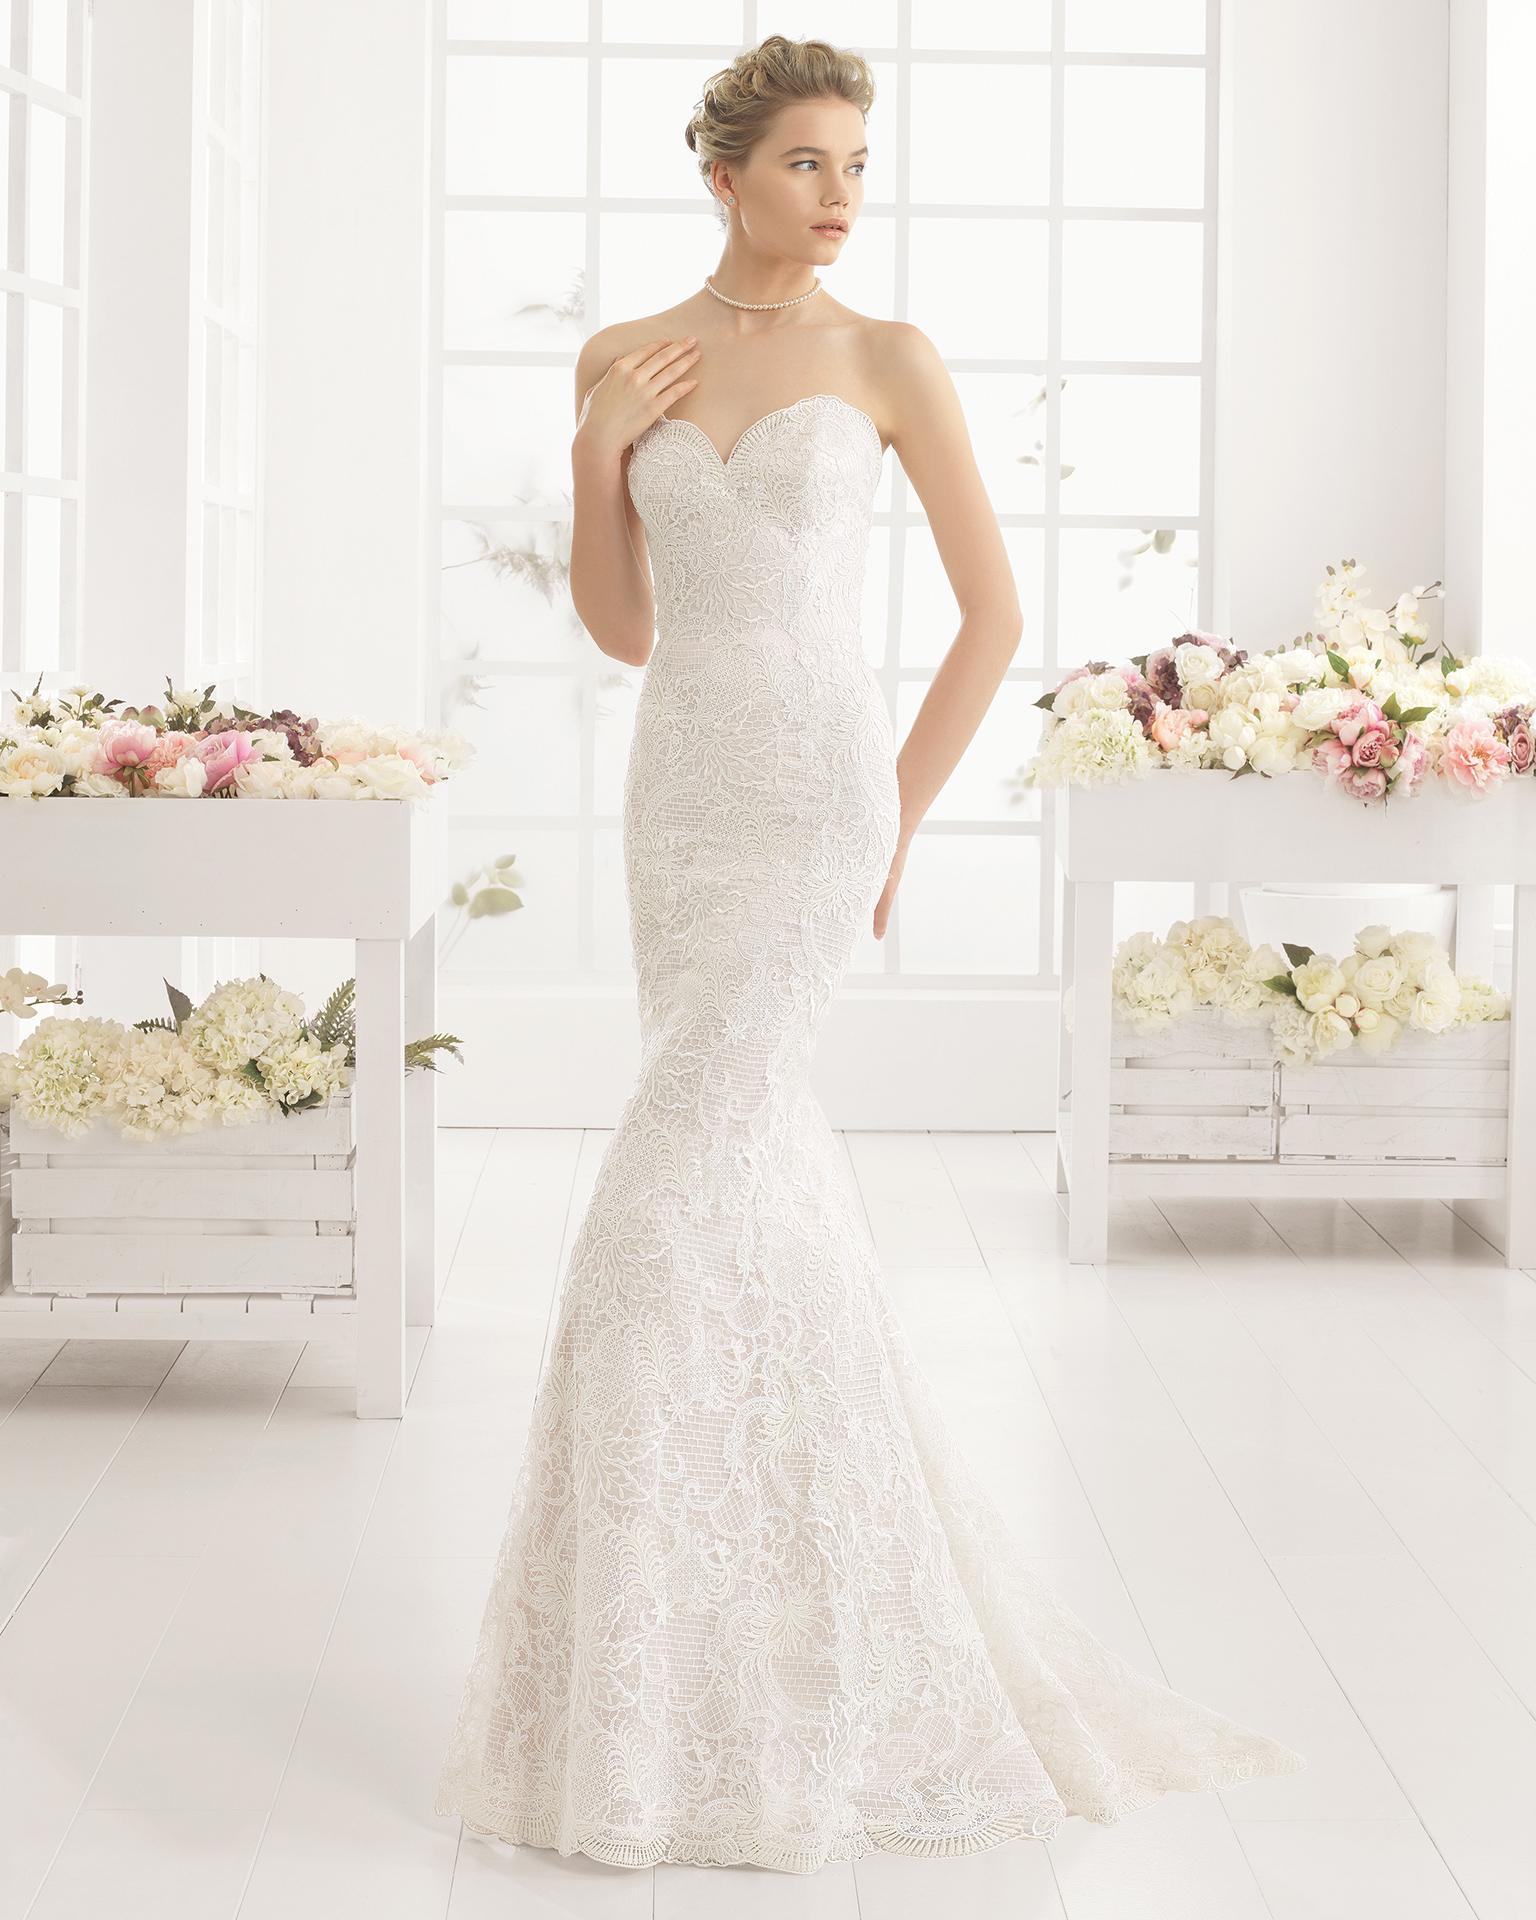 MALORY wedding dress - Aire Barcelona 2016.